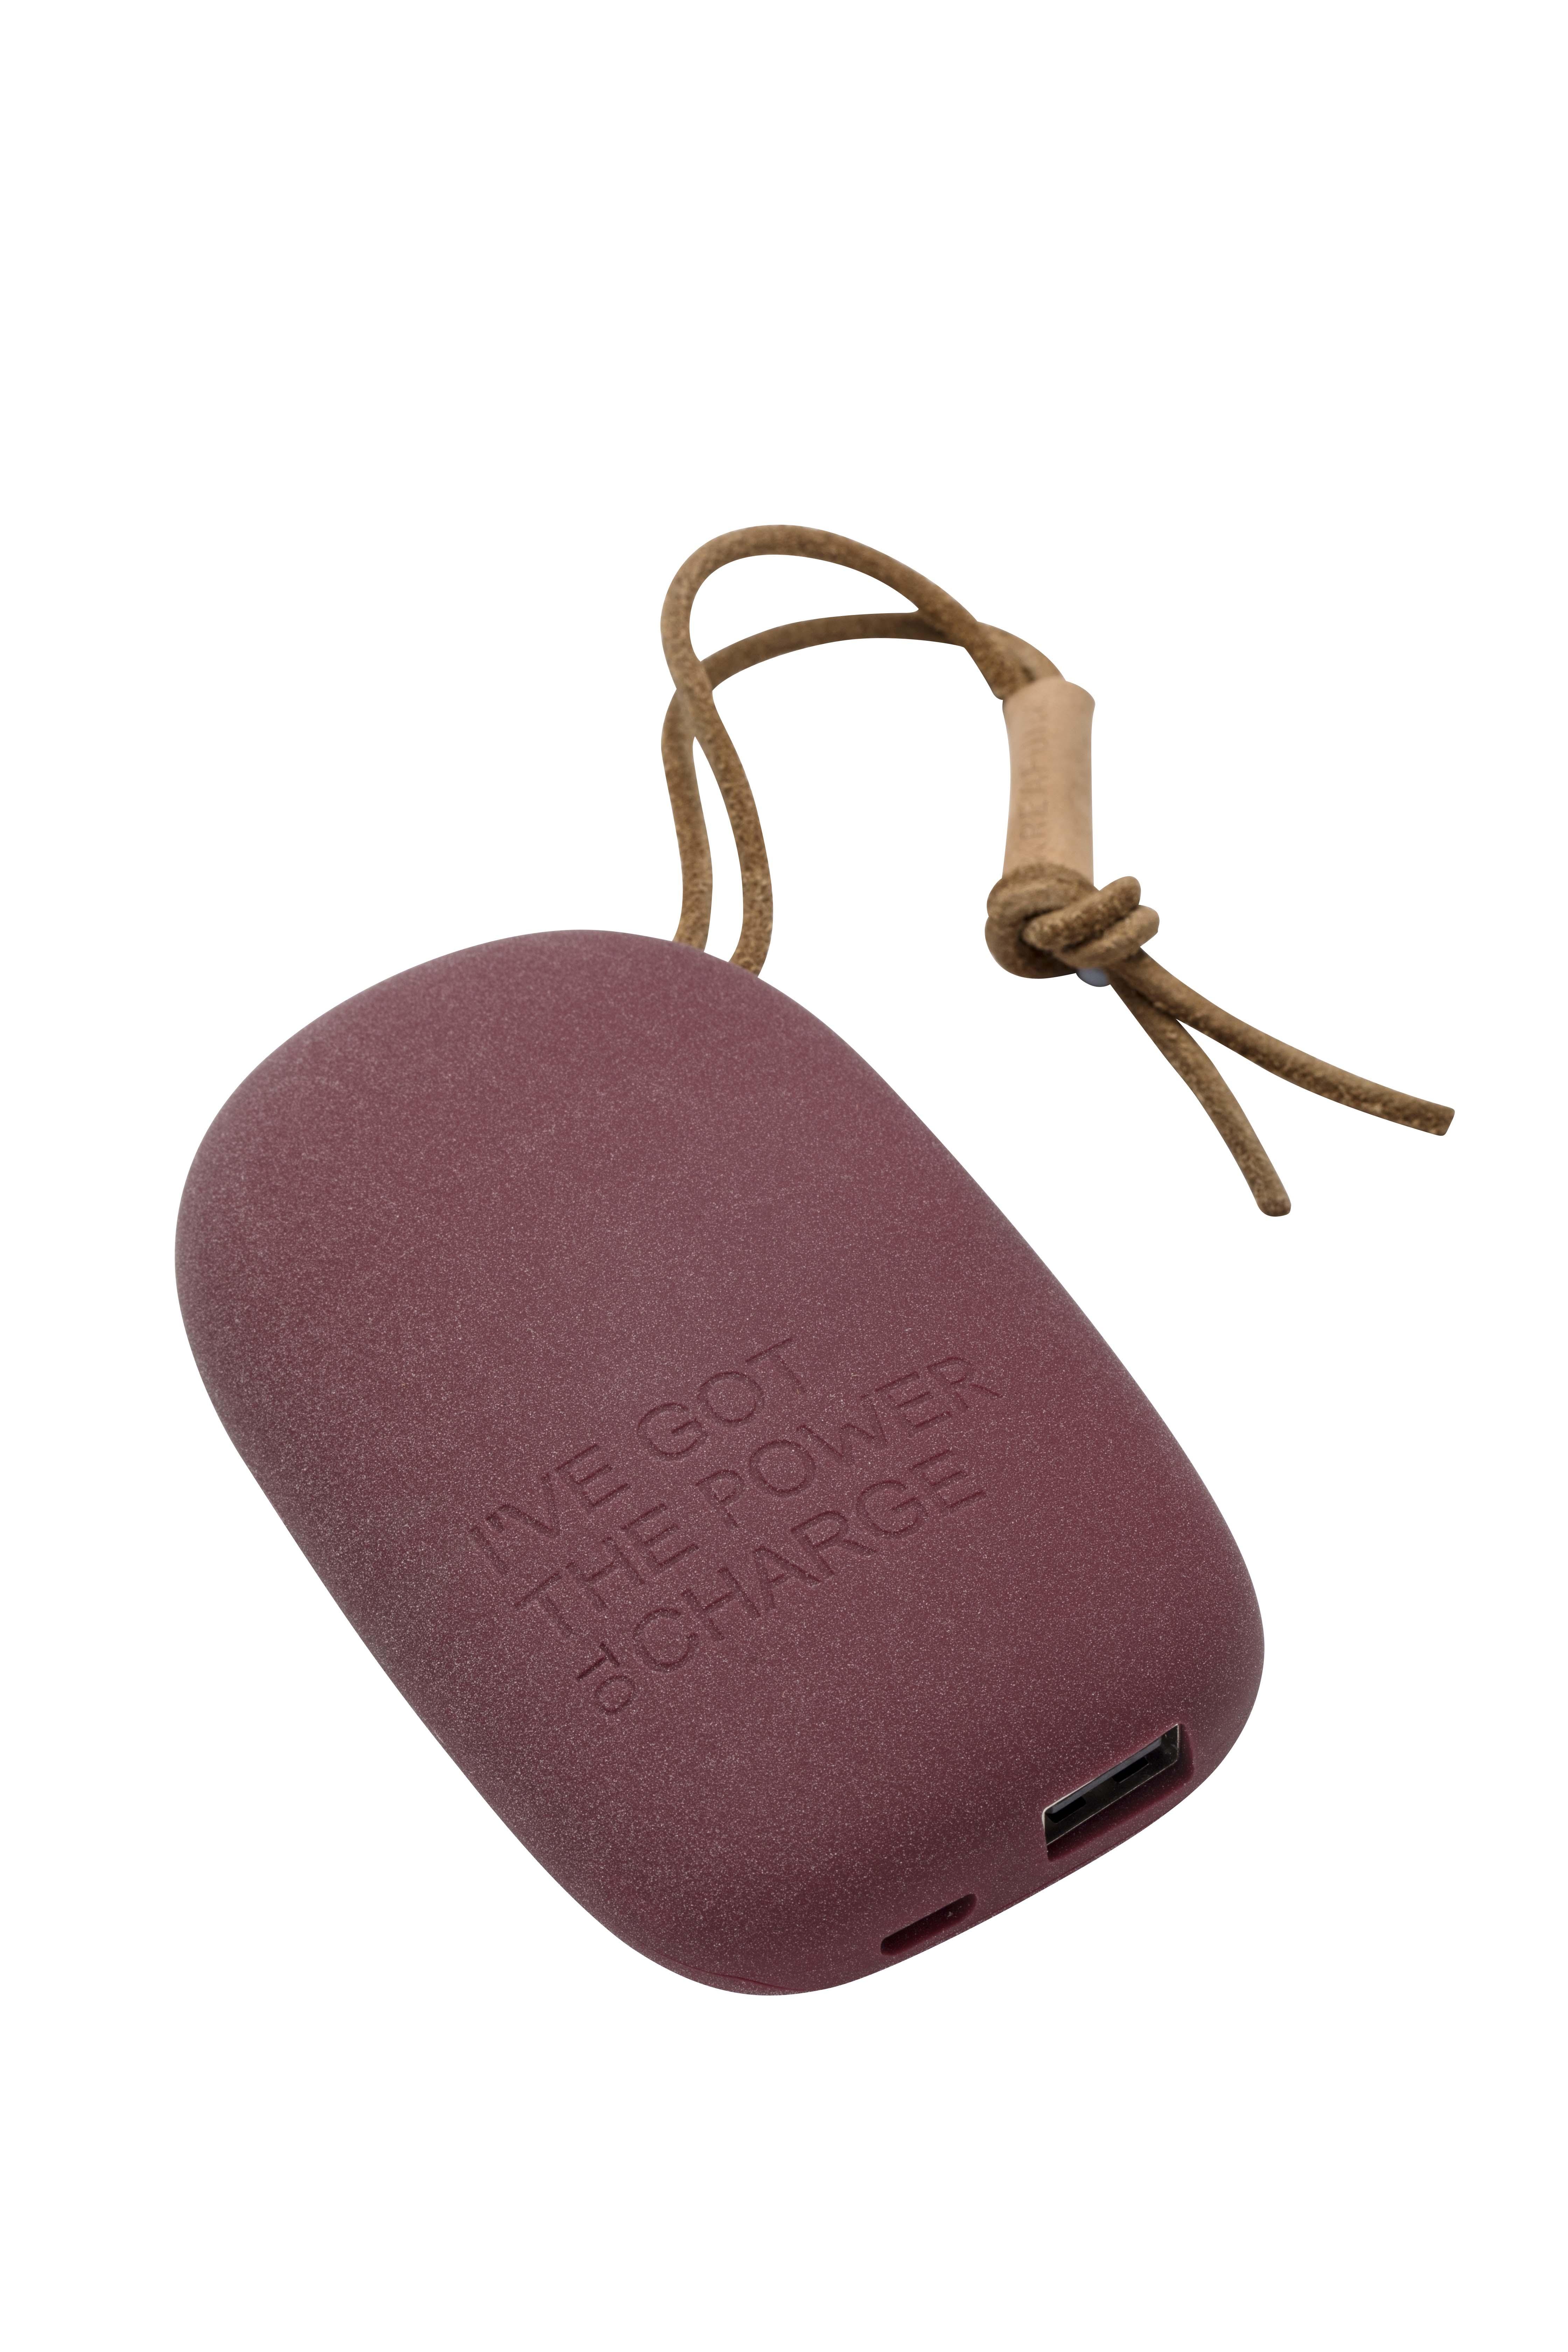 Batterie externe portable violet